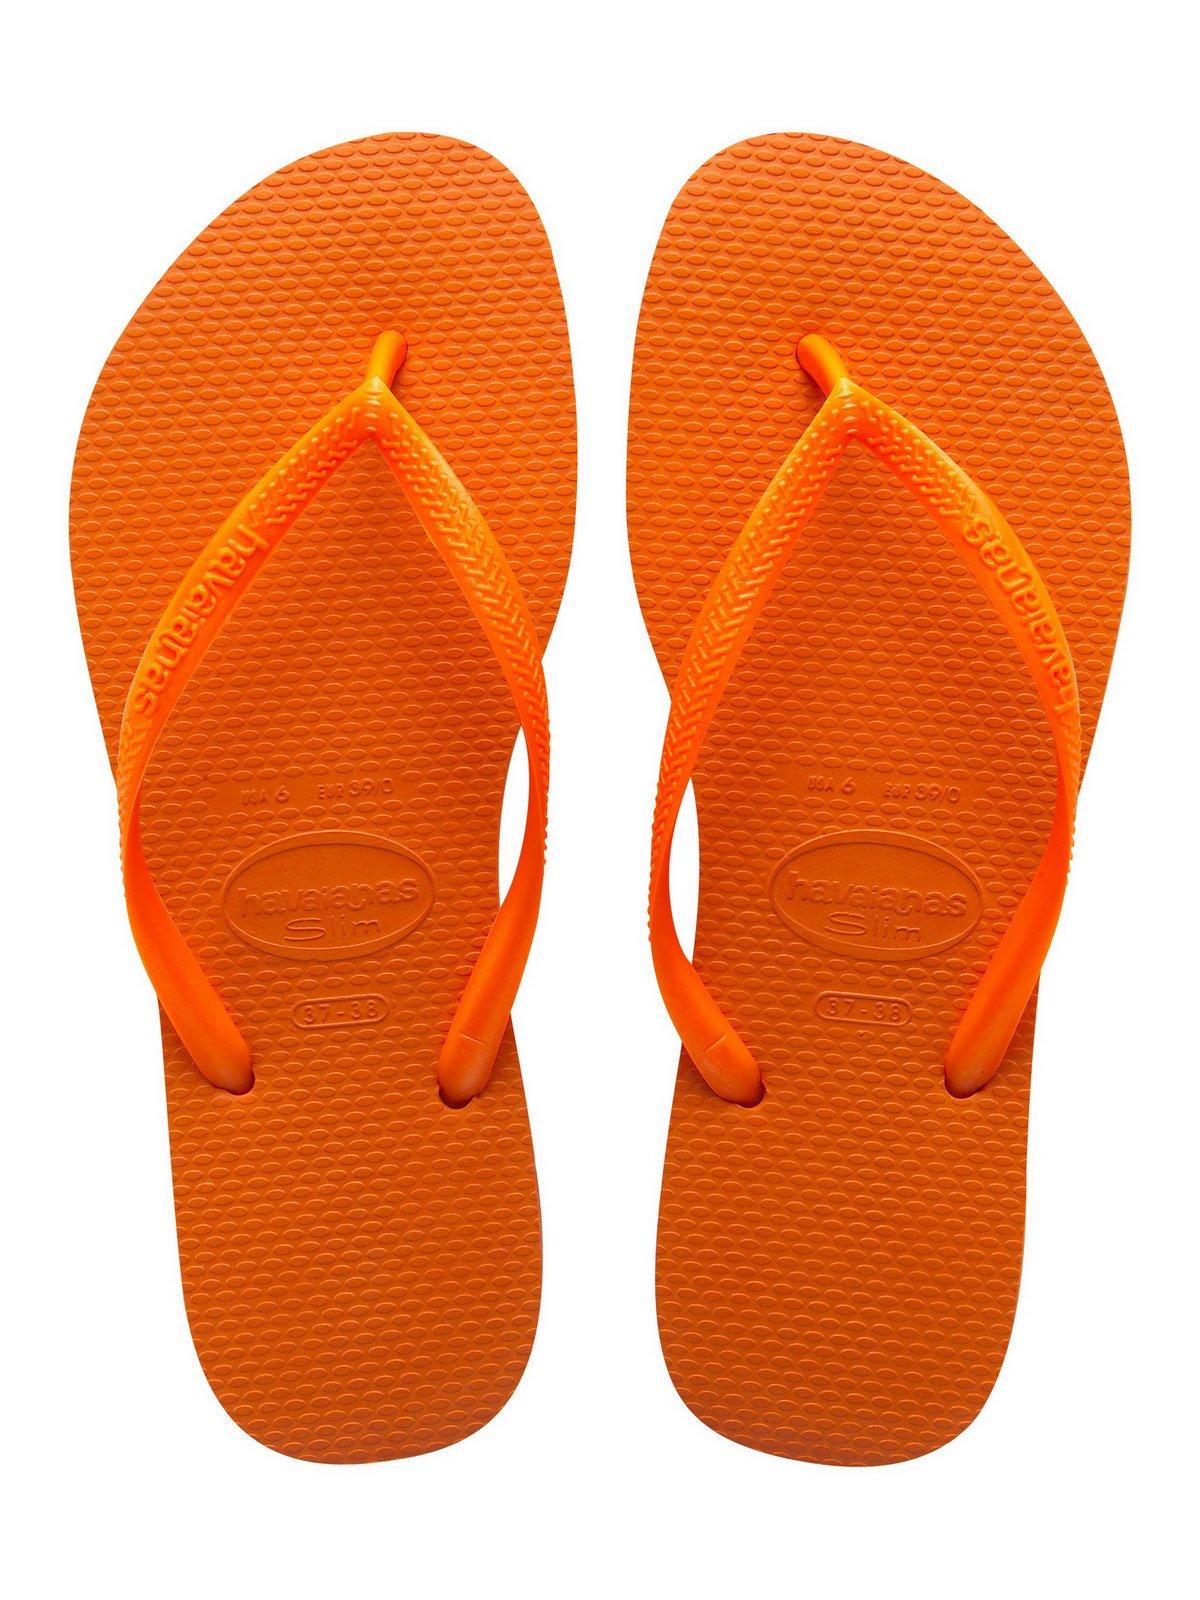 0d1ad780944e Flip-Flops Flip-flops - Slim Neon Orange - Brand Havaianas